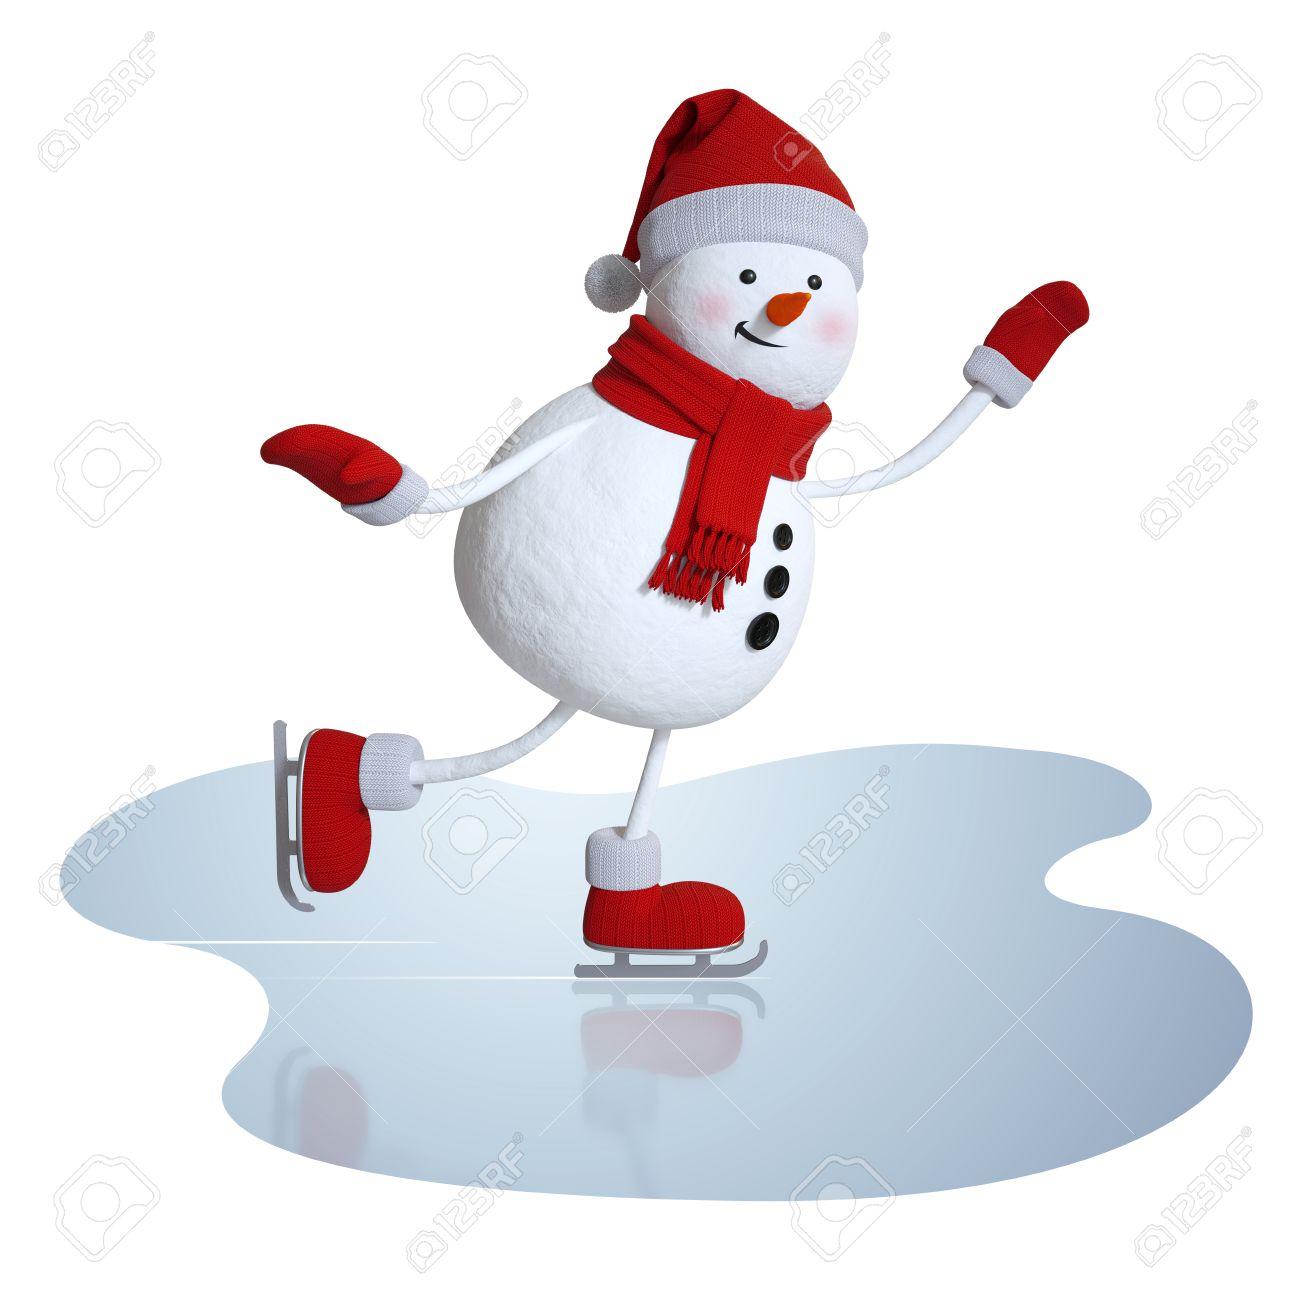 3d snowman figure skating winter sports clipart stock photo rh 123rf com winter sports clipart free winter sports cartoon clipart